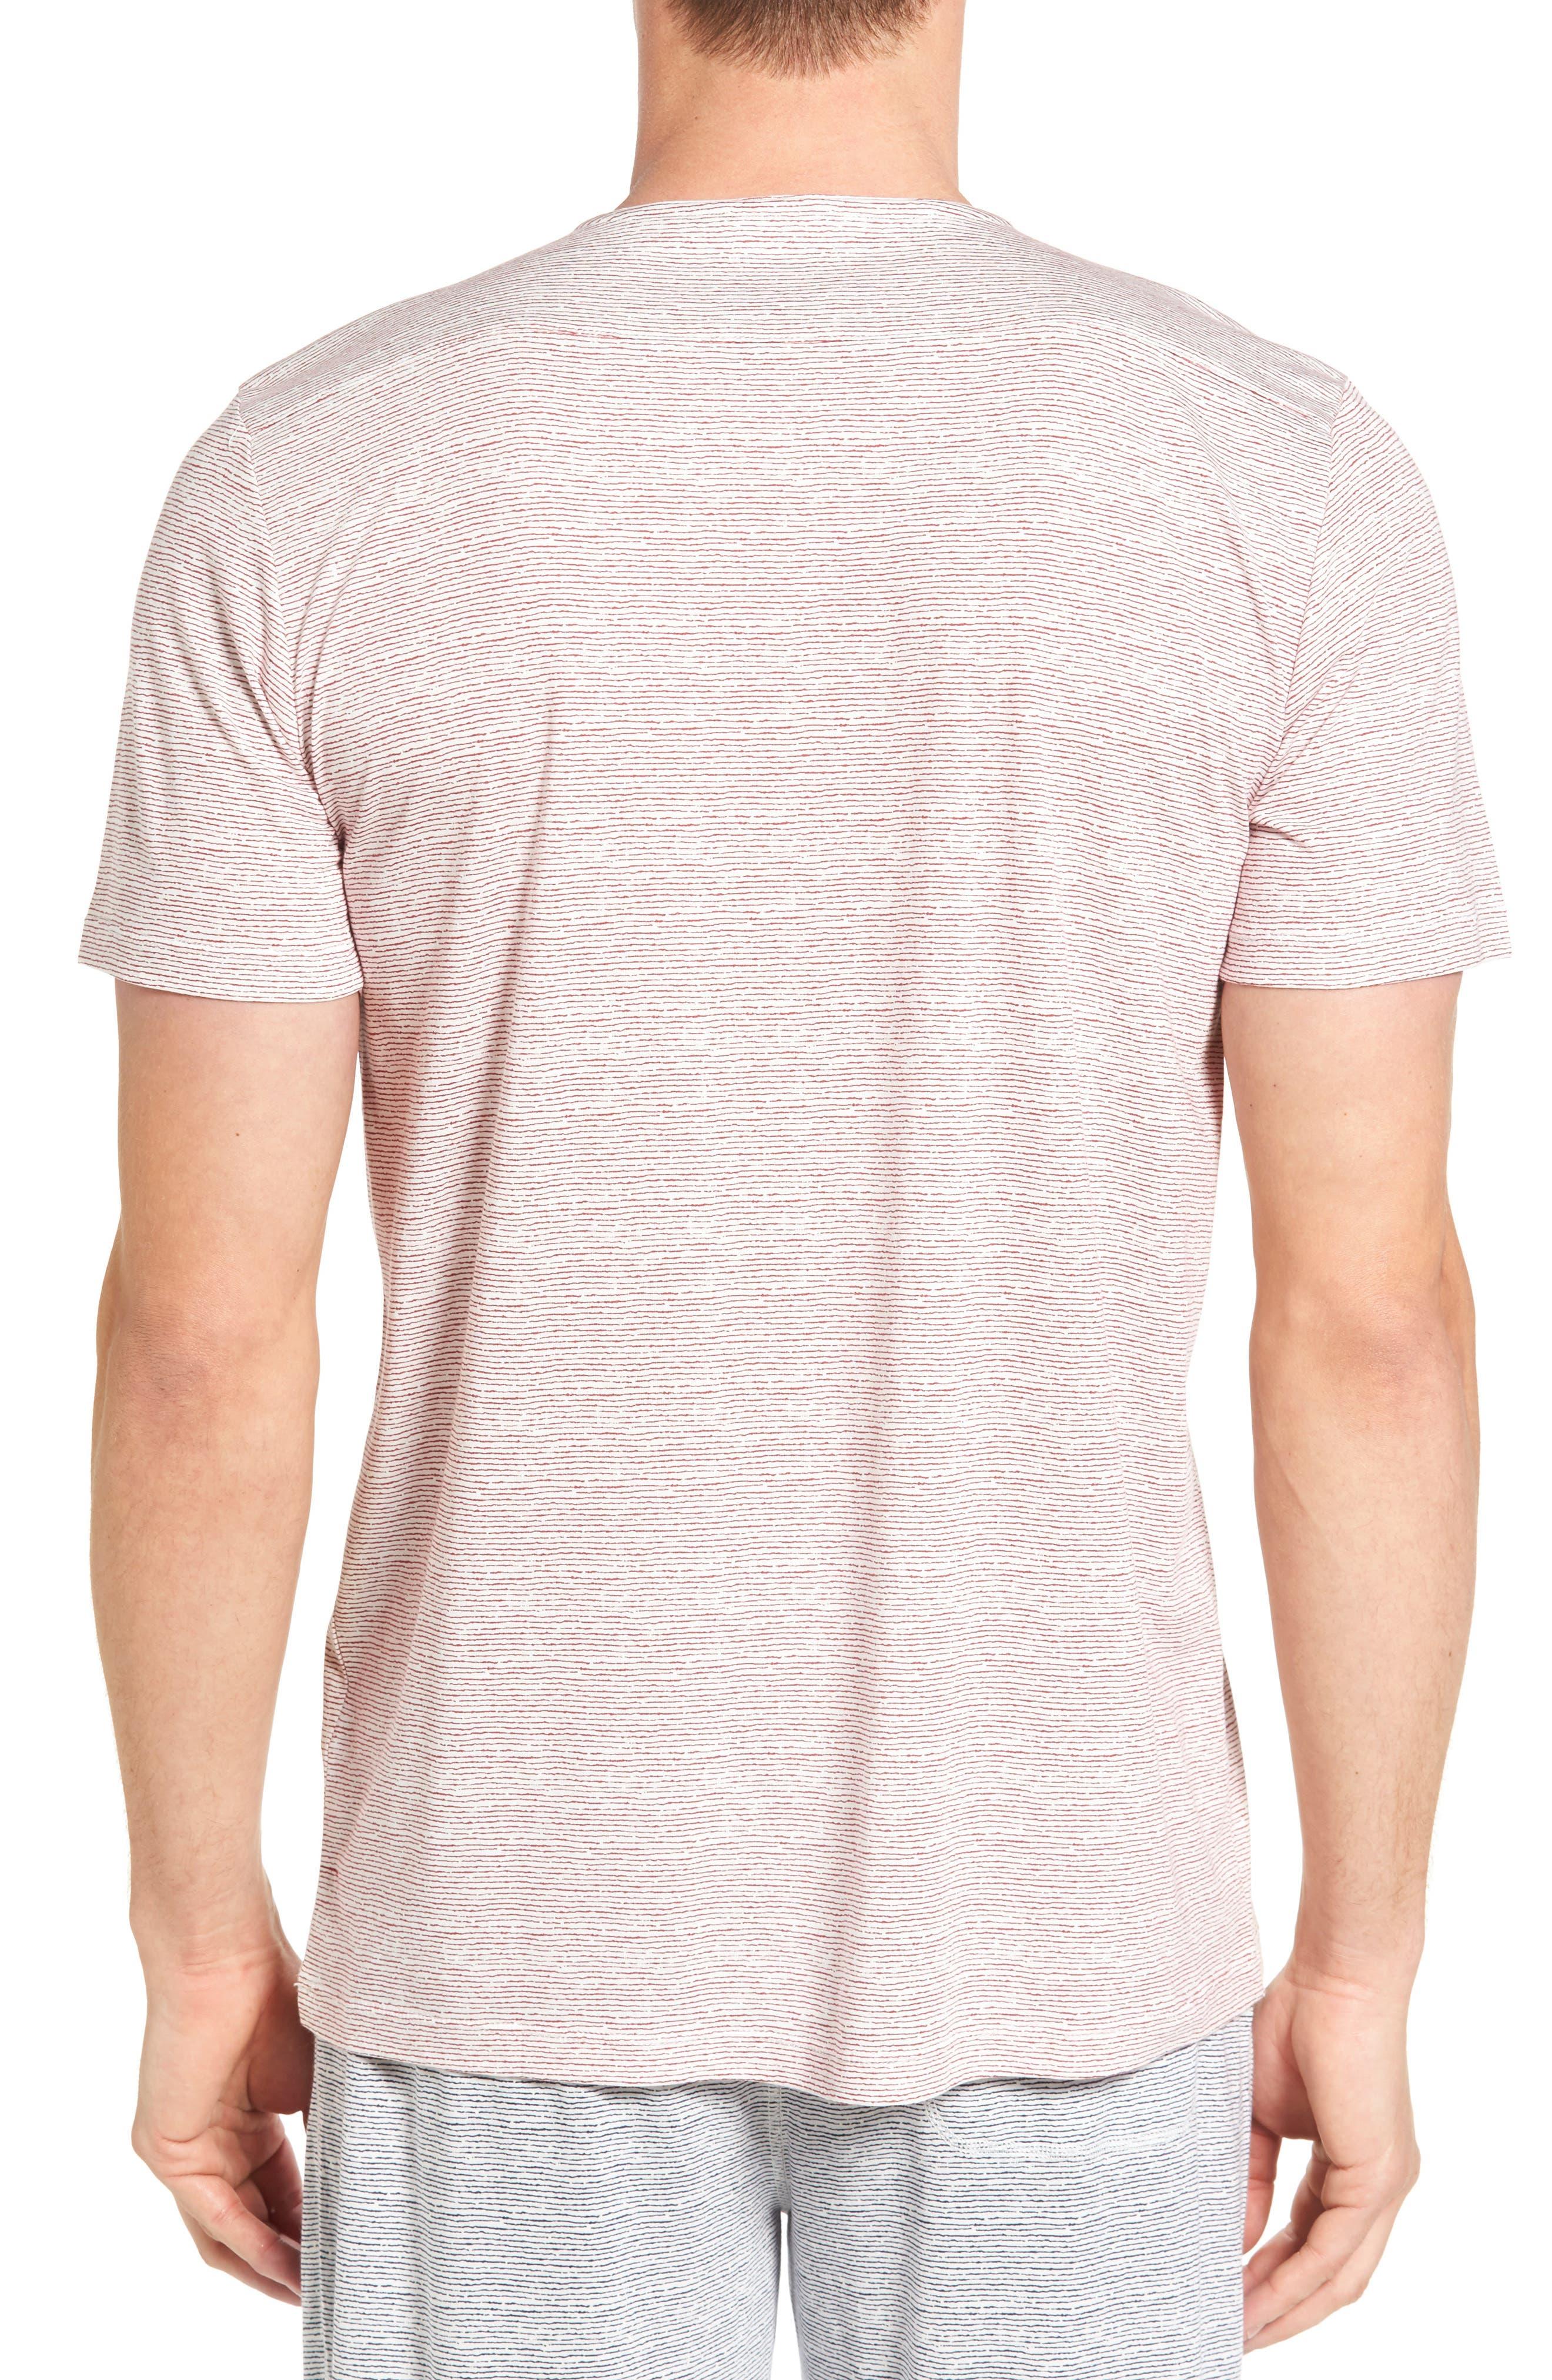 Alternate Image 2  - Daniel Buchler Feeder Stripe Pima Cotton & Modal V-Neck T-Shirt